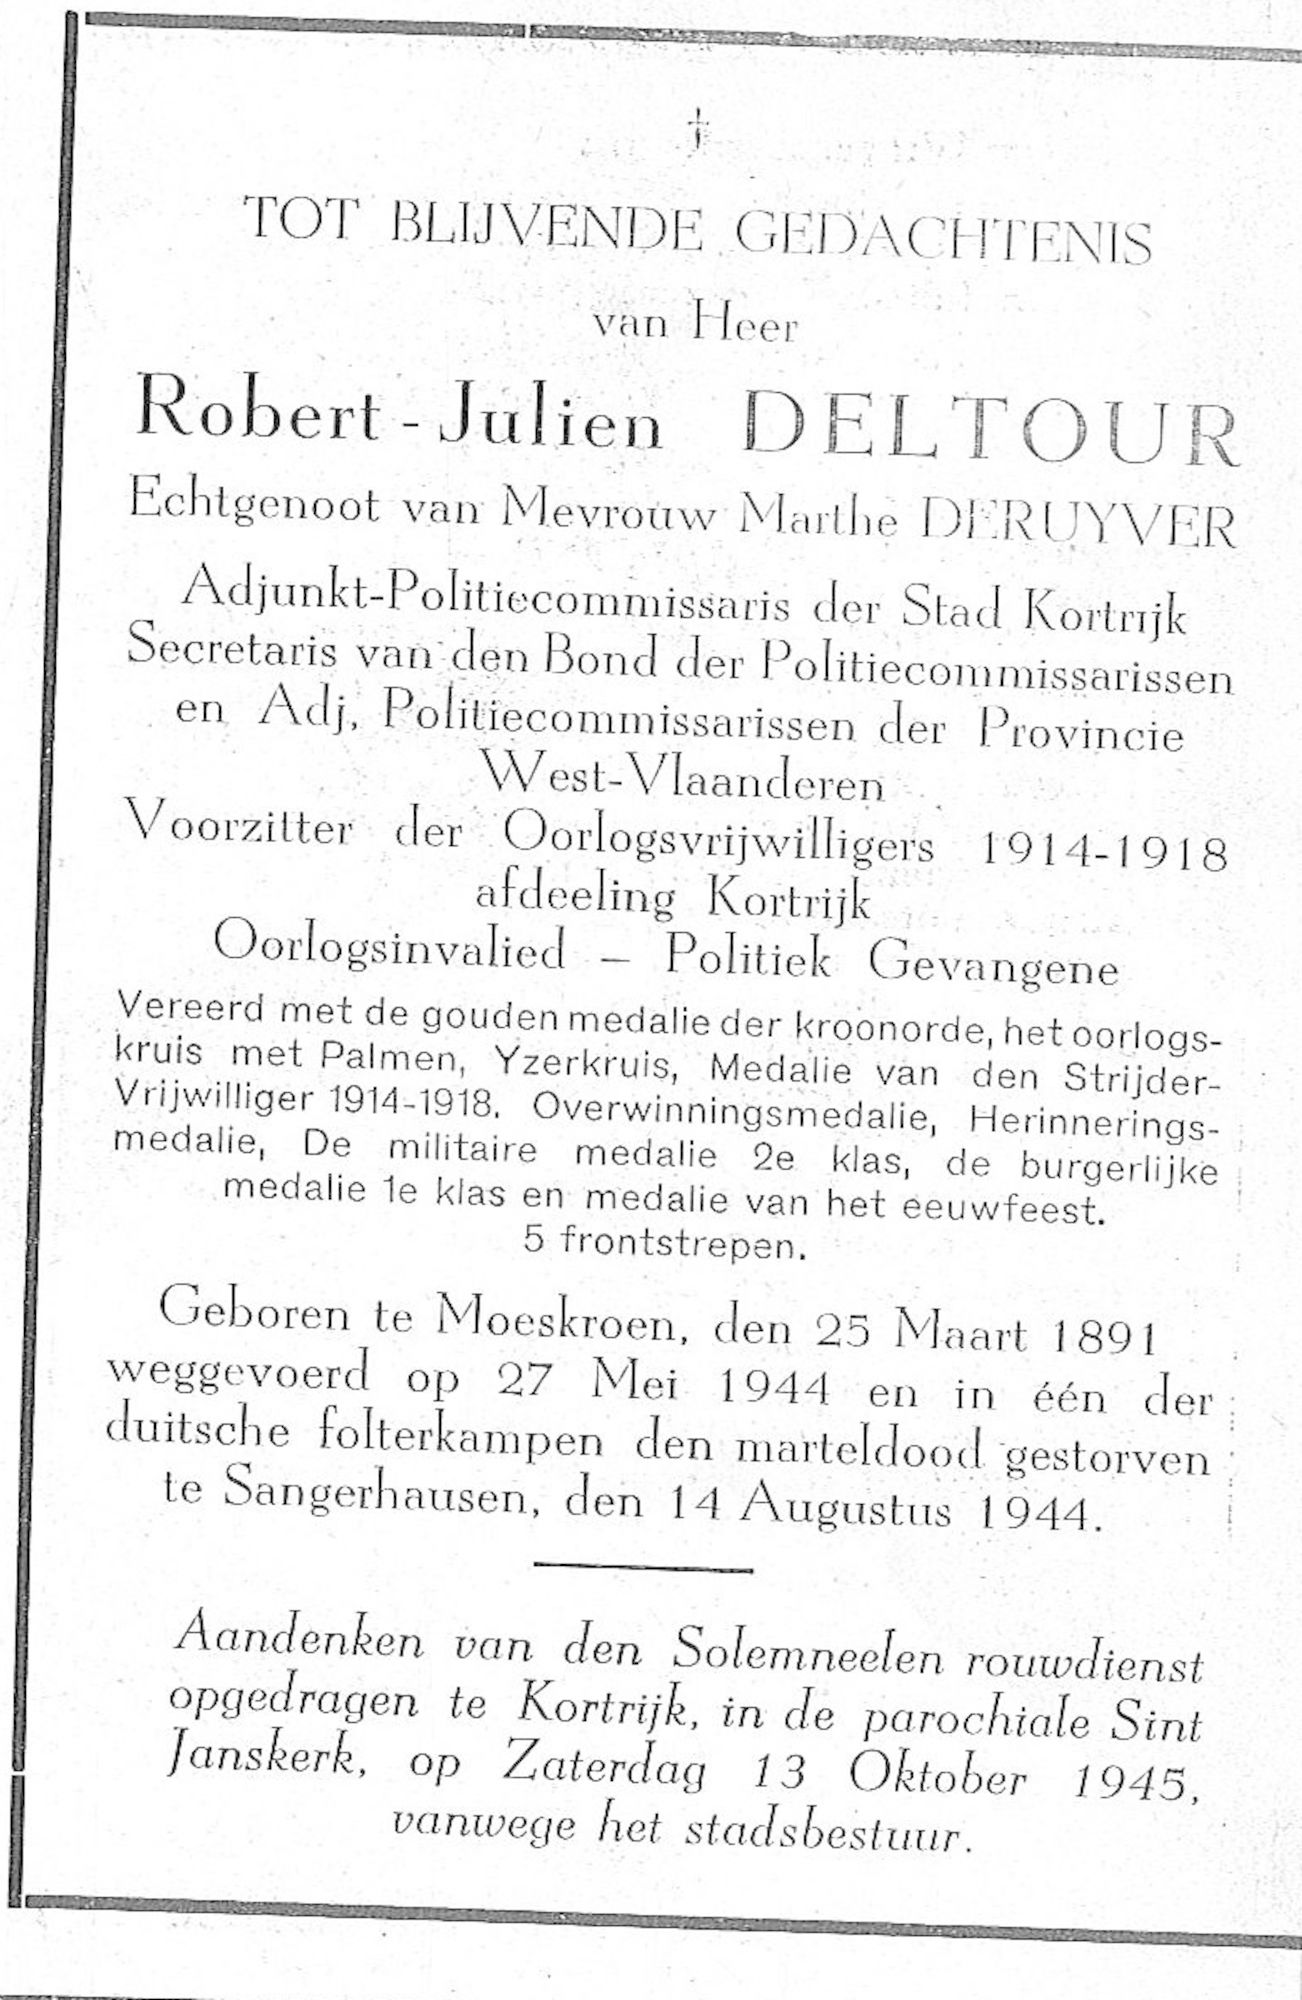 Deltour Robert-Julien